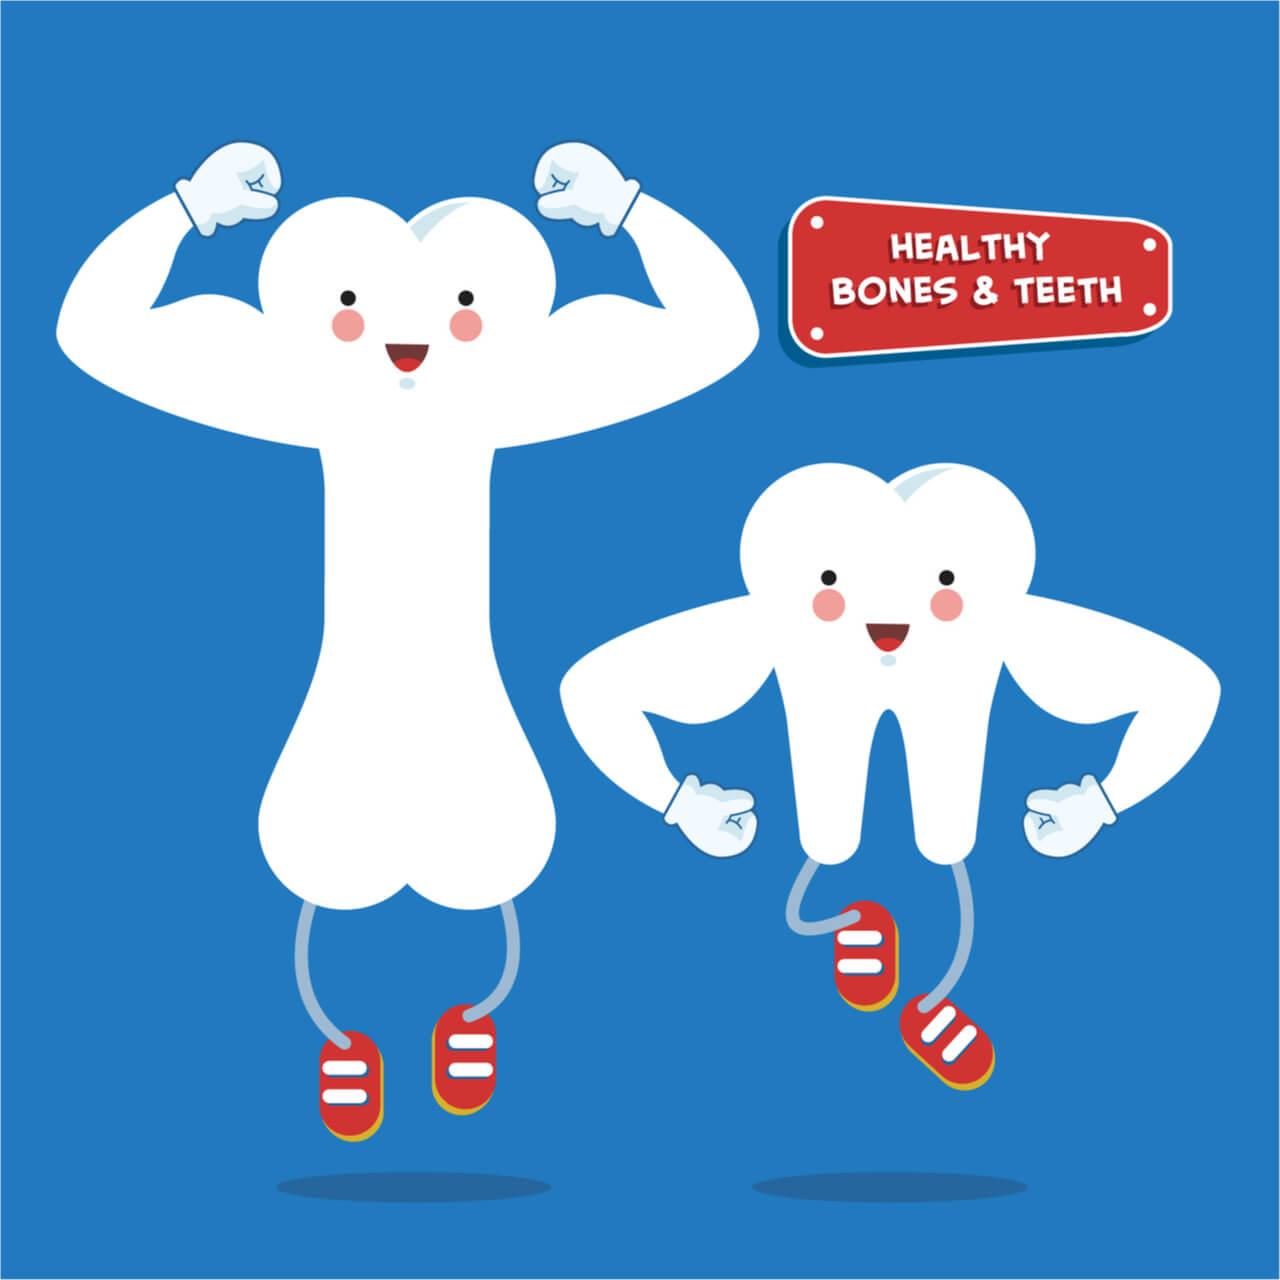 Top 4 Essential Vitamins For Teeth and Bones